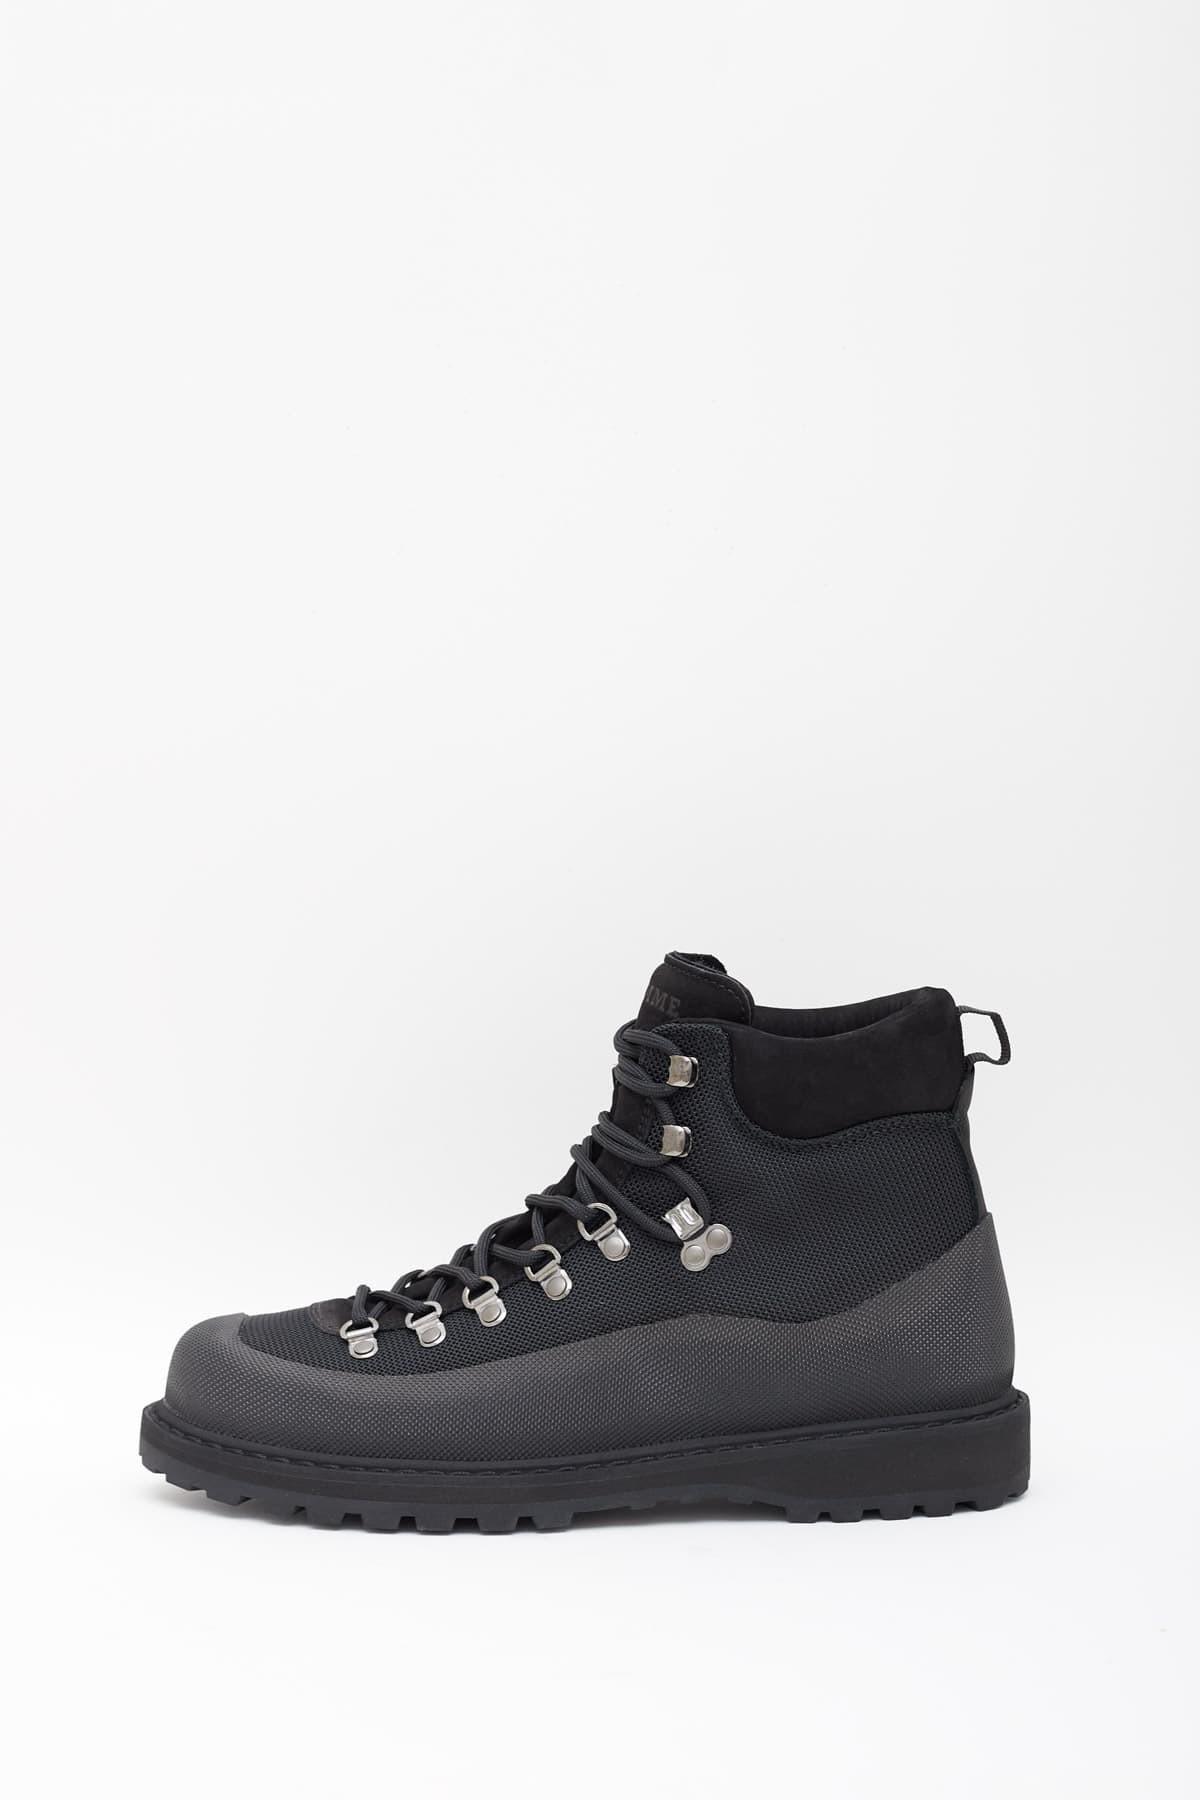 Comprar Maison Kitsuné Black Grey Fox Classic Sweatshirt